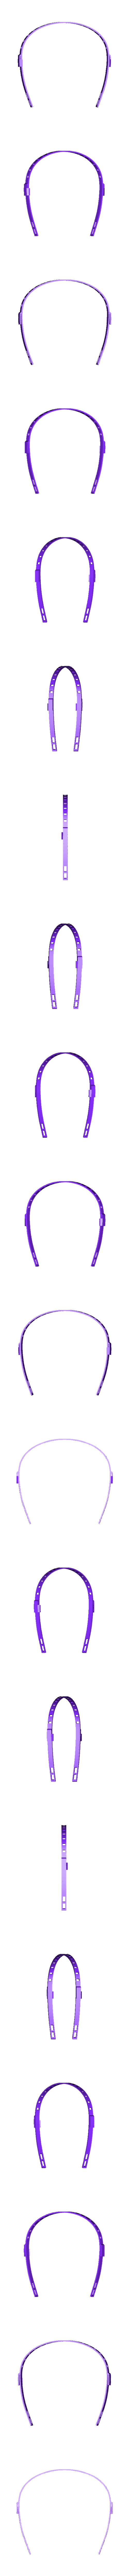 Universal_Covid19_FaceShield_v8.stl Download free STL file Universal Covid-19 Face Shield • Design to 3D print, DimensionArg